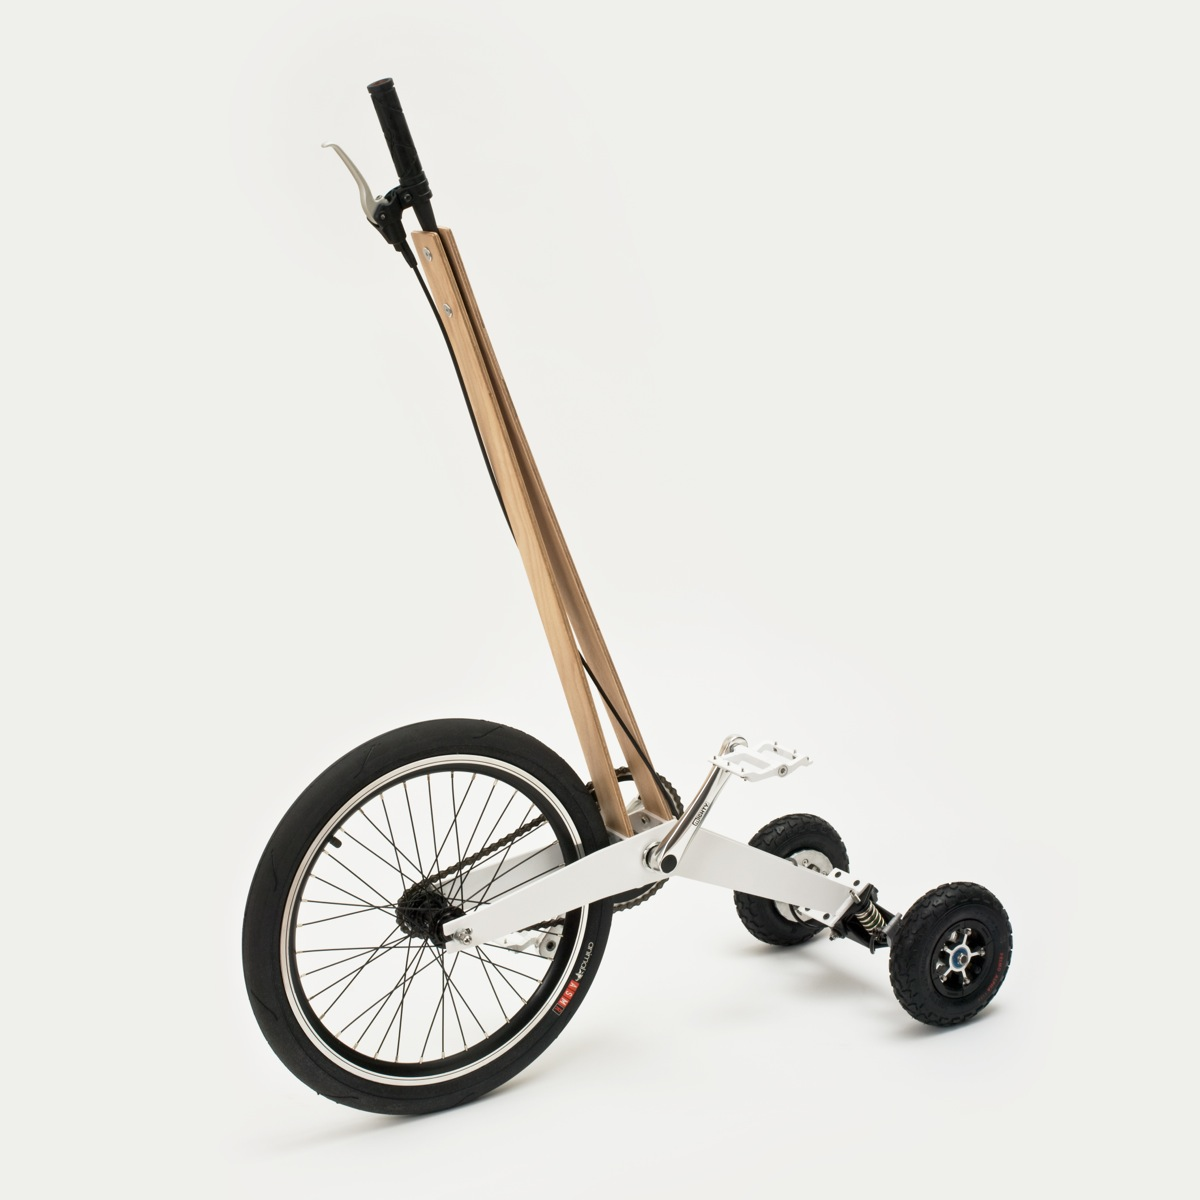 kolelinia halfbike halbes fahrrad voller spa f rderland. Black Bedroom Furniture Sets. Home Design Ideas